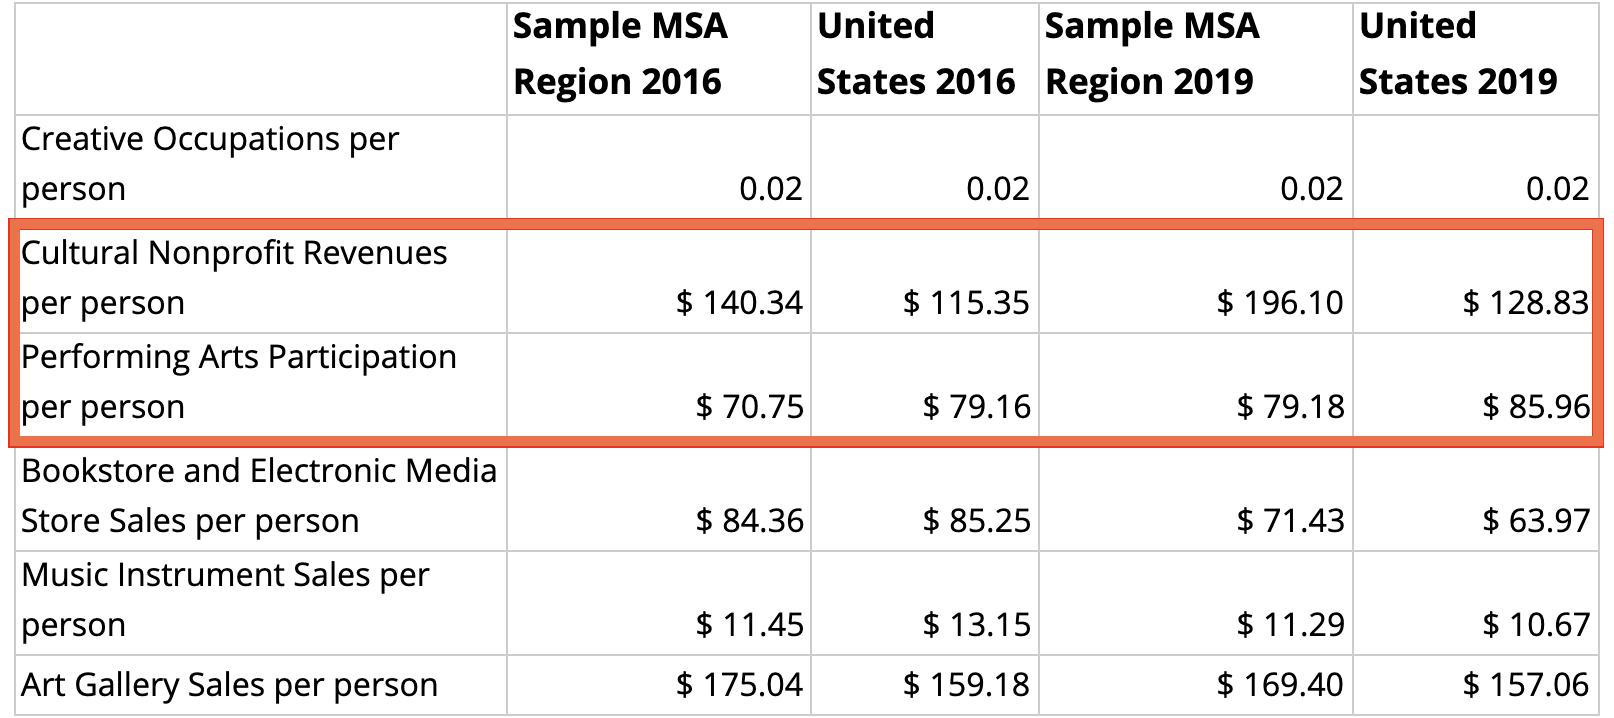 Comparing revenues table in the CVI